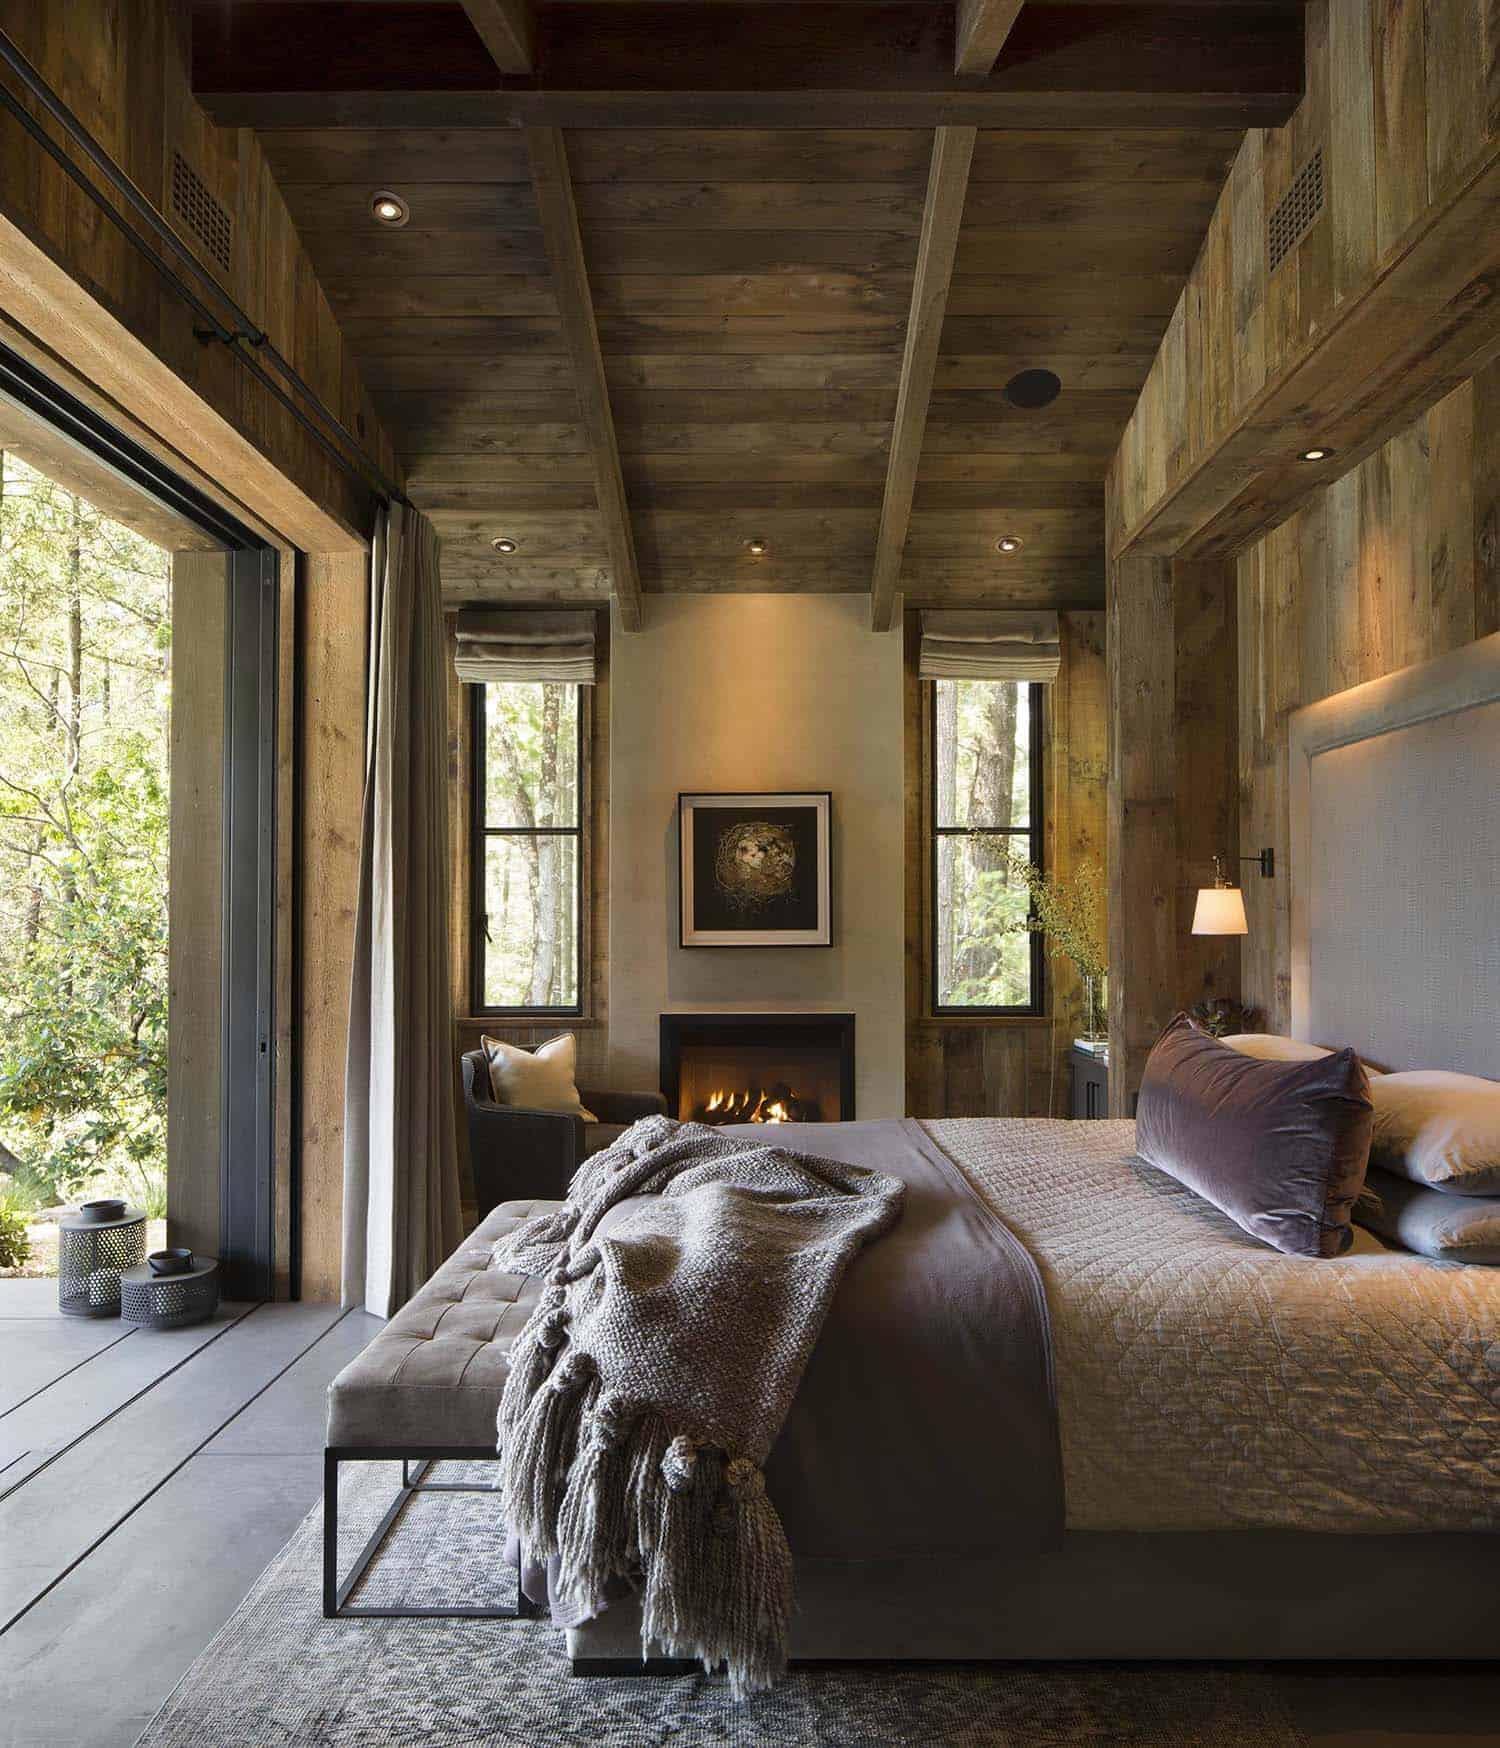 Rustic Chic Bedroom: 101 Rustic Style Bedroom Ideas (Photos